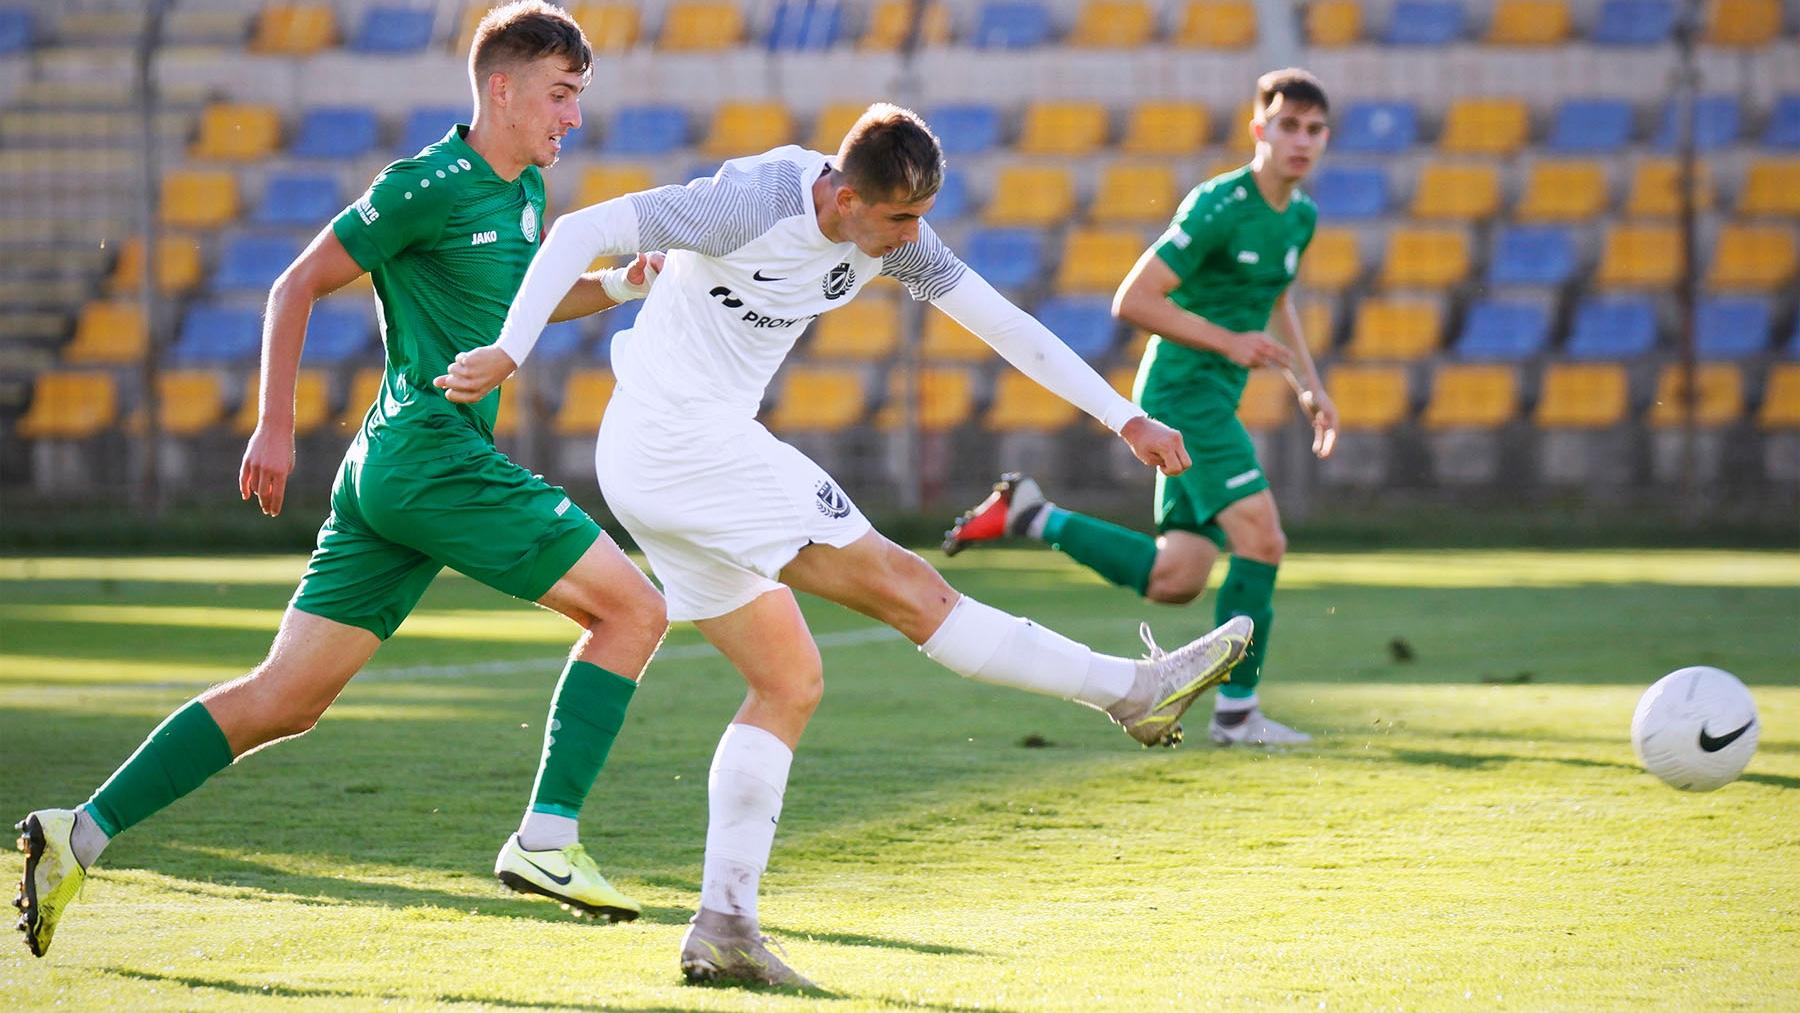 Képgaléria: MTK Budapest II - Paksi FC II 1-0